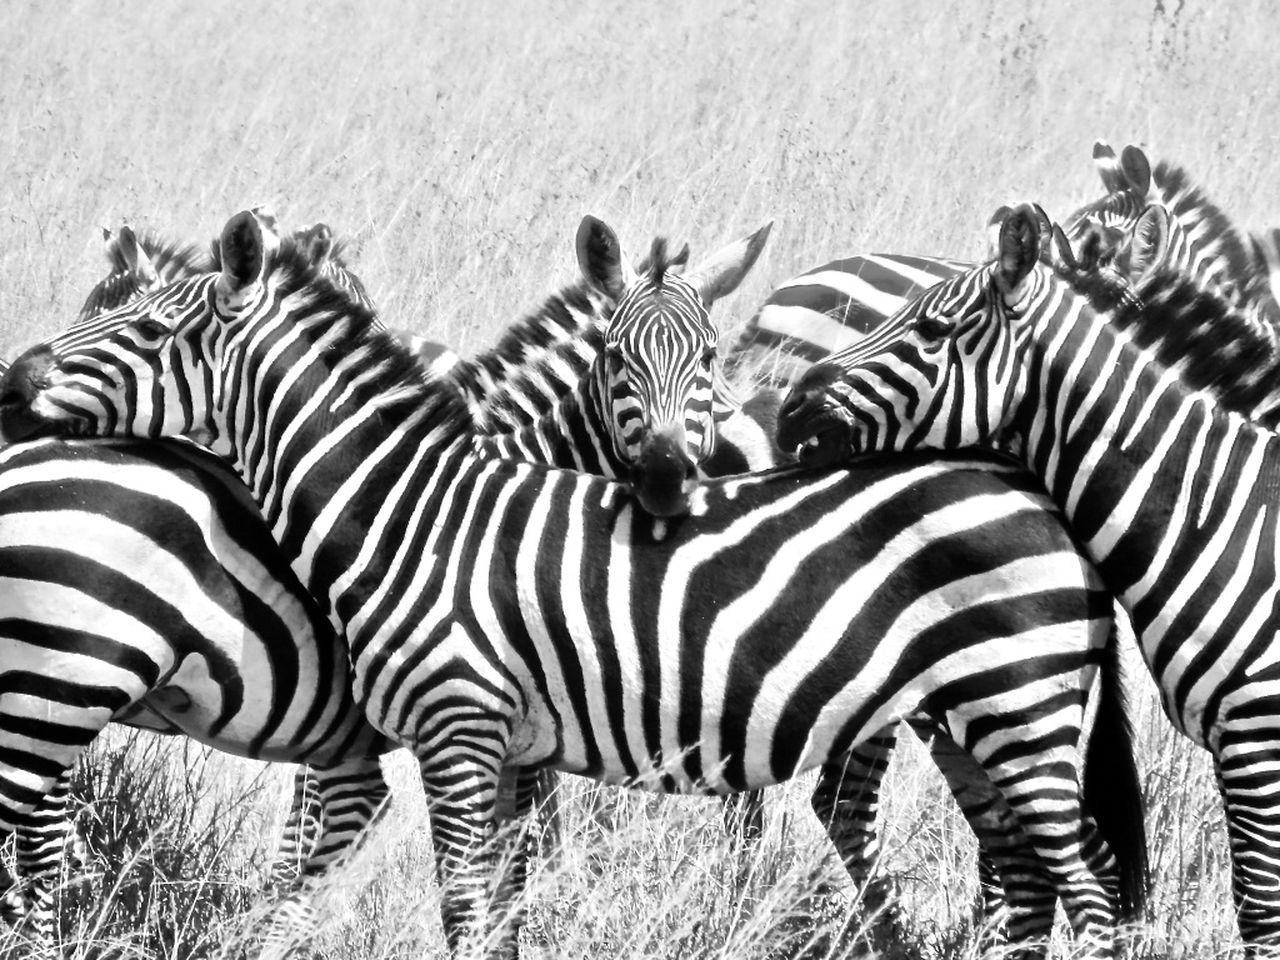 striped, zebra, animals in the wild, animal wildlife, animal themes, outdoors, mammal, no people, safari animals, nature, grass, day, wilderness area